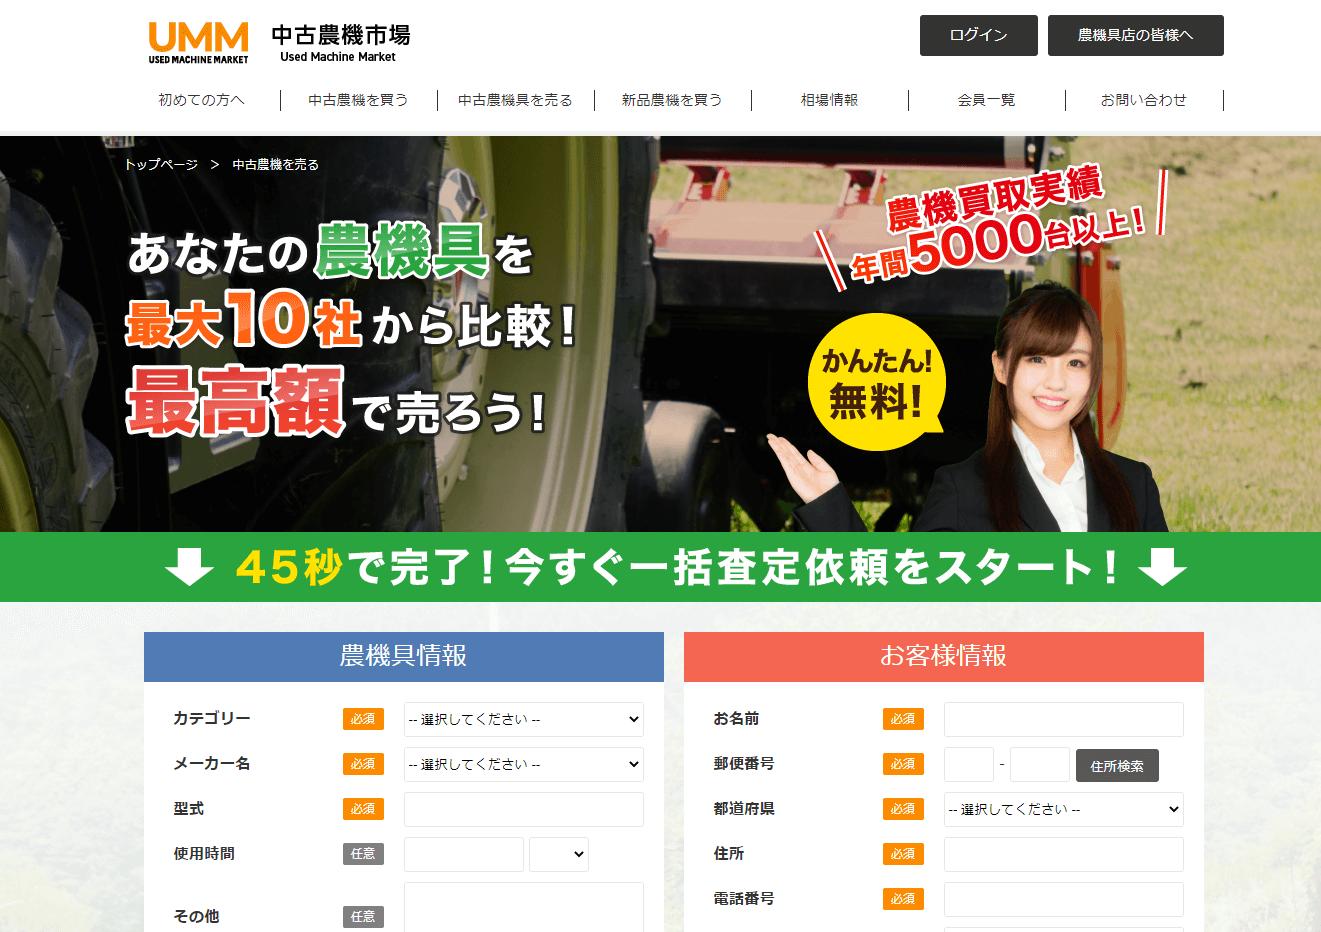 UMM(中古農機市場)